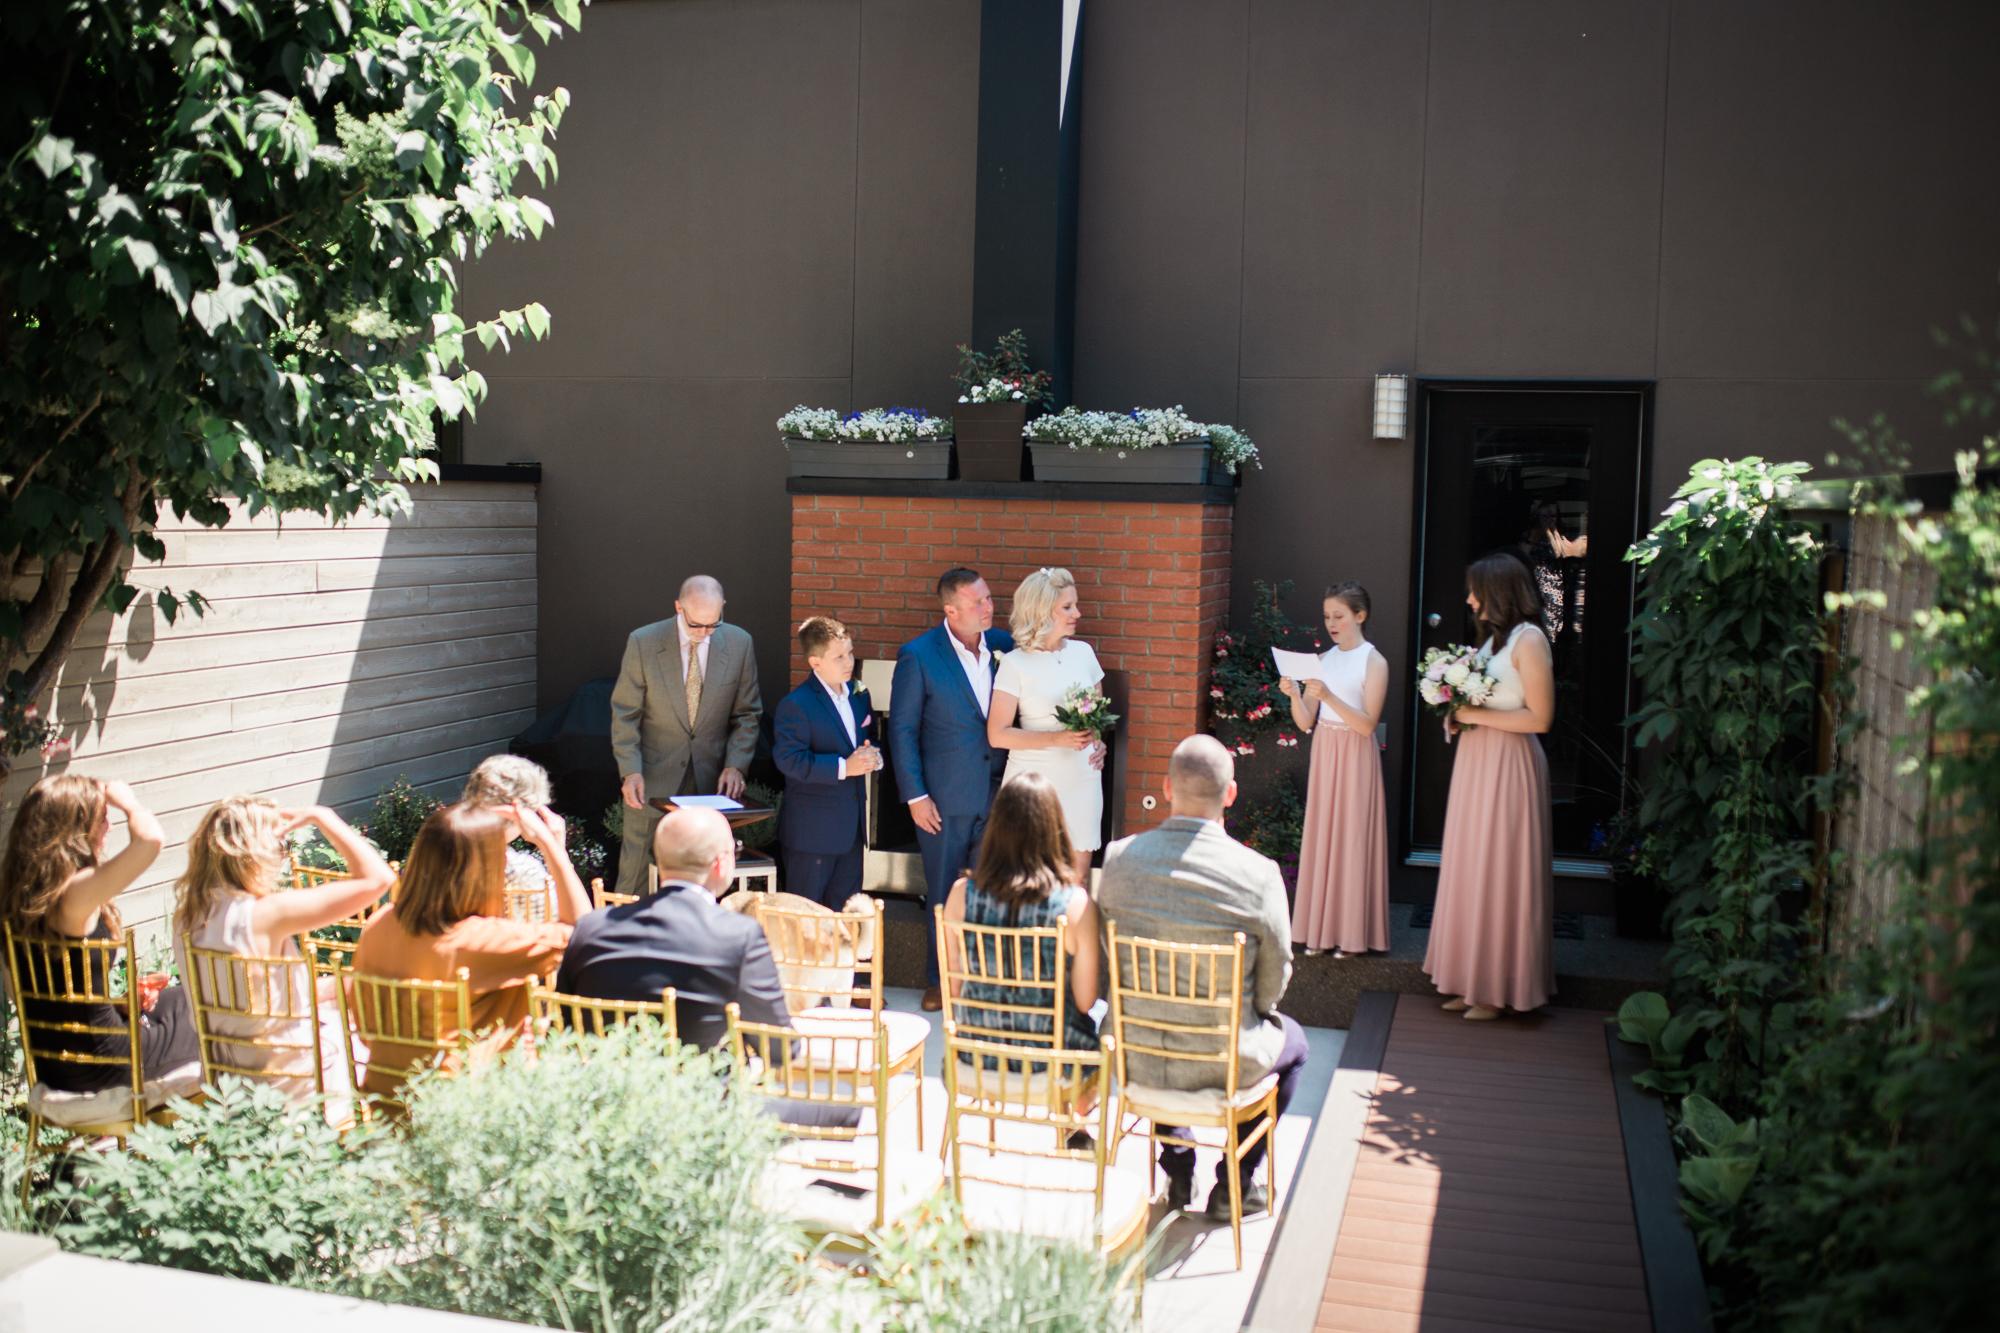 Calgary-wedding-photographer-CG-24.jpg